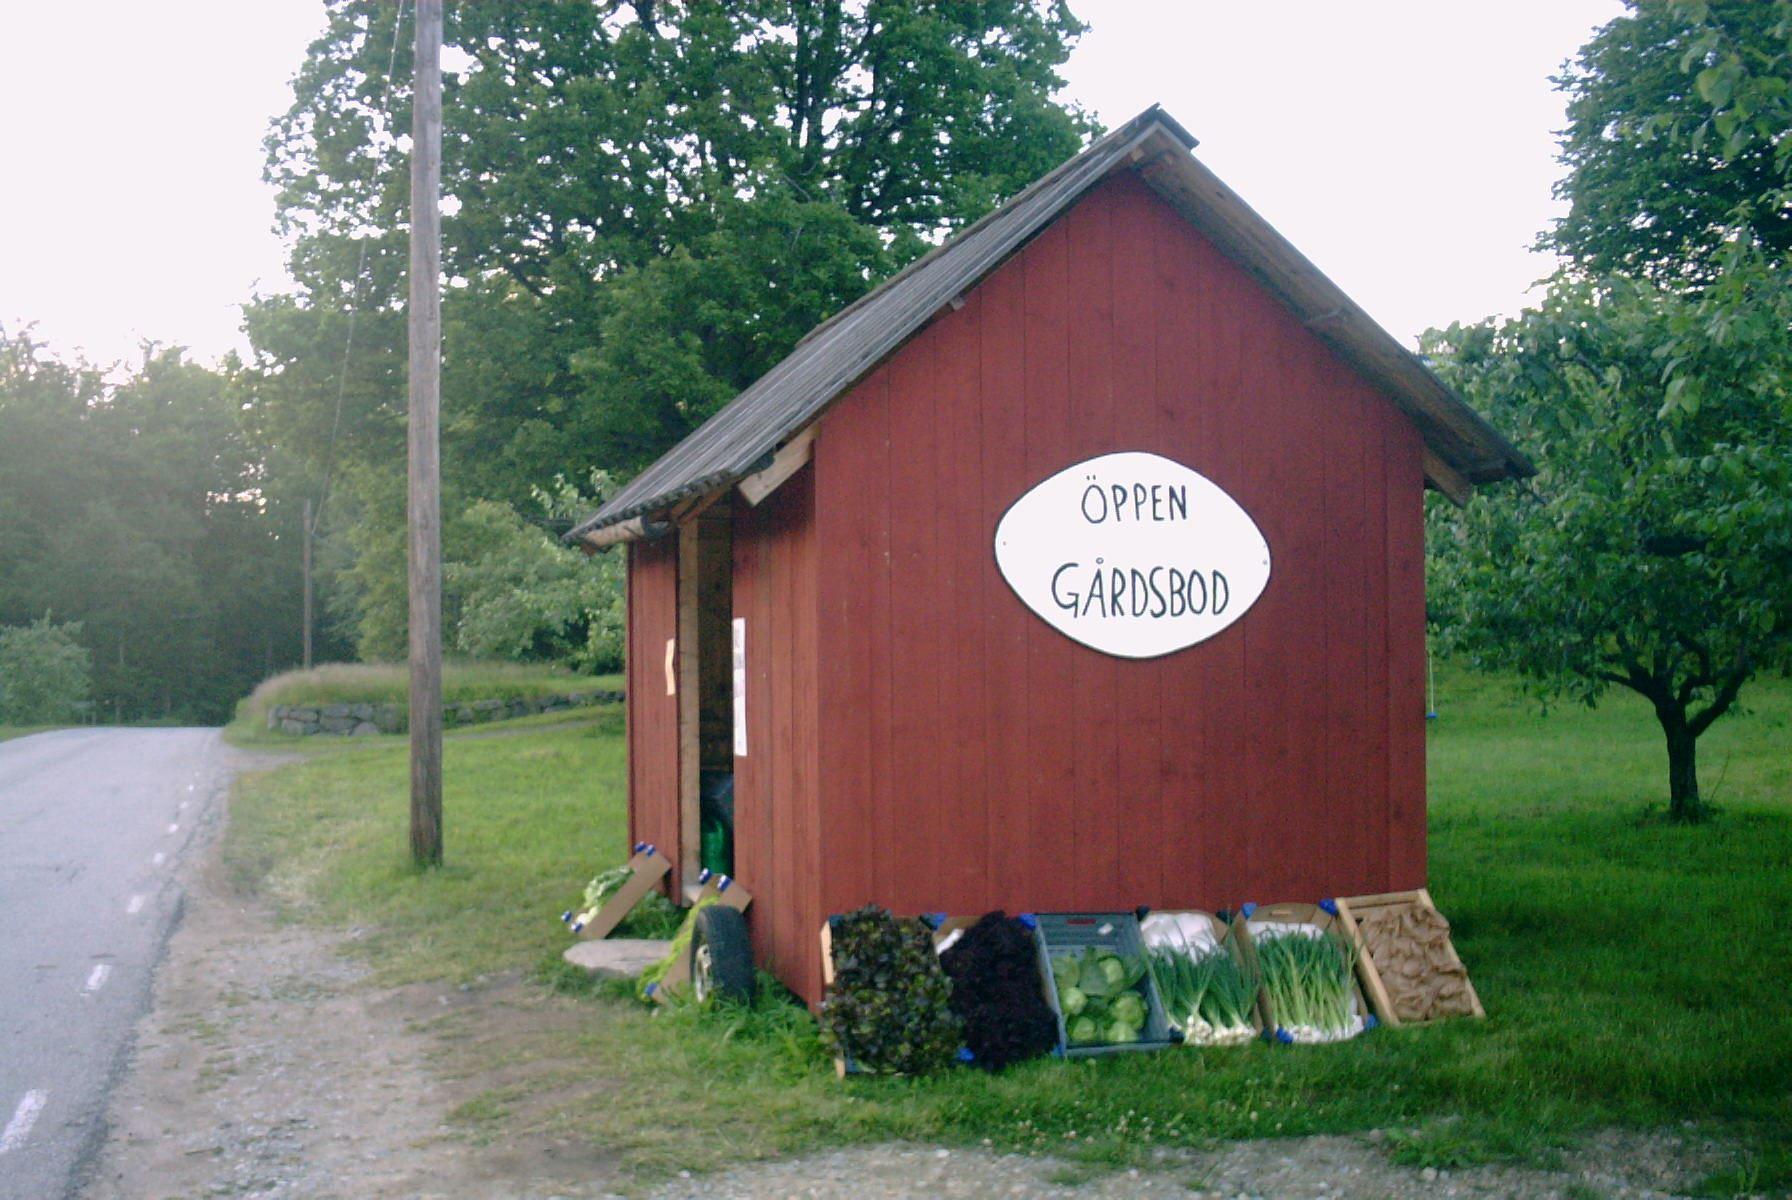 The Farm Shop in Ugglekull